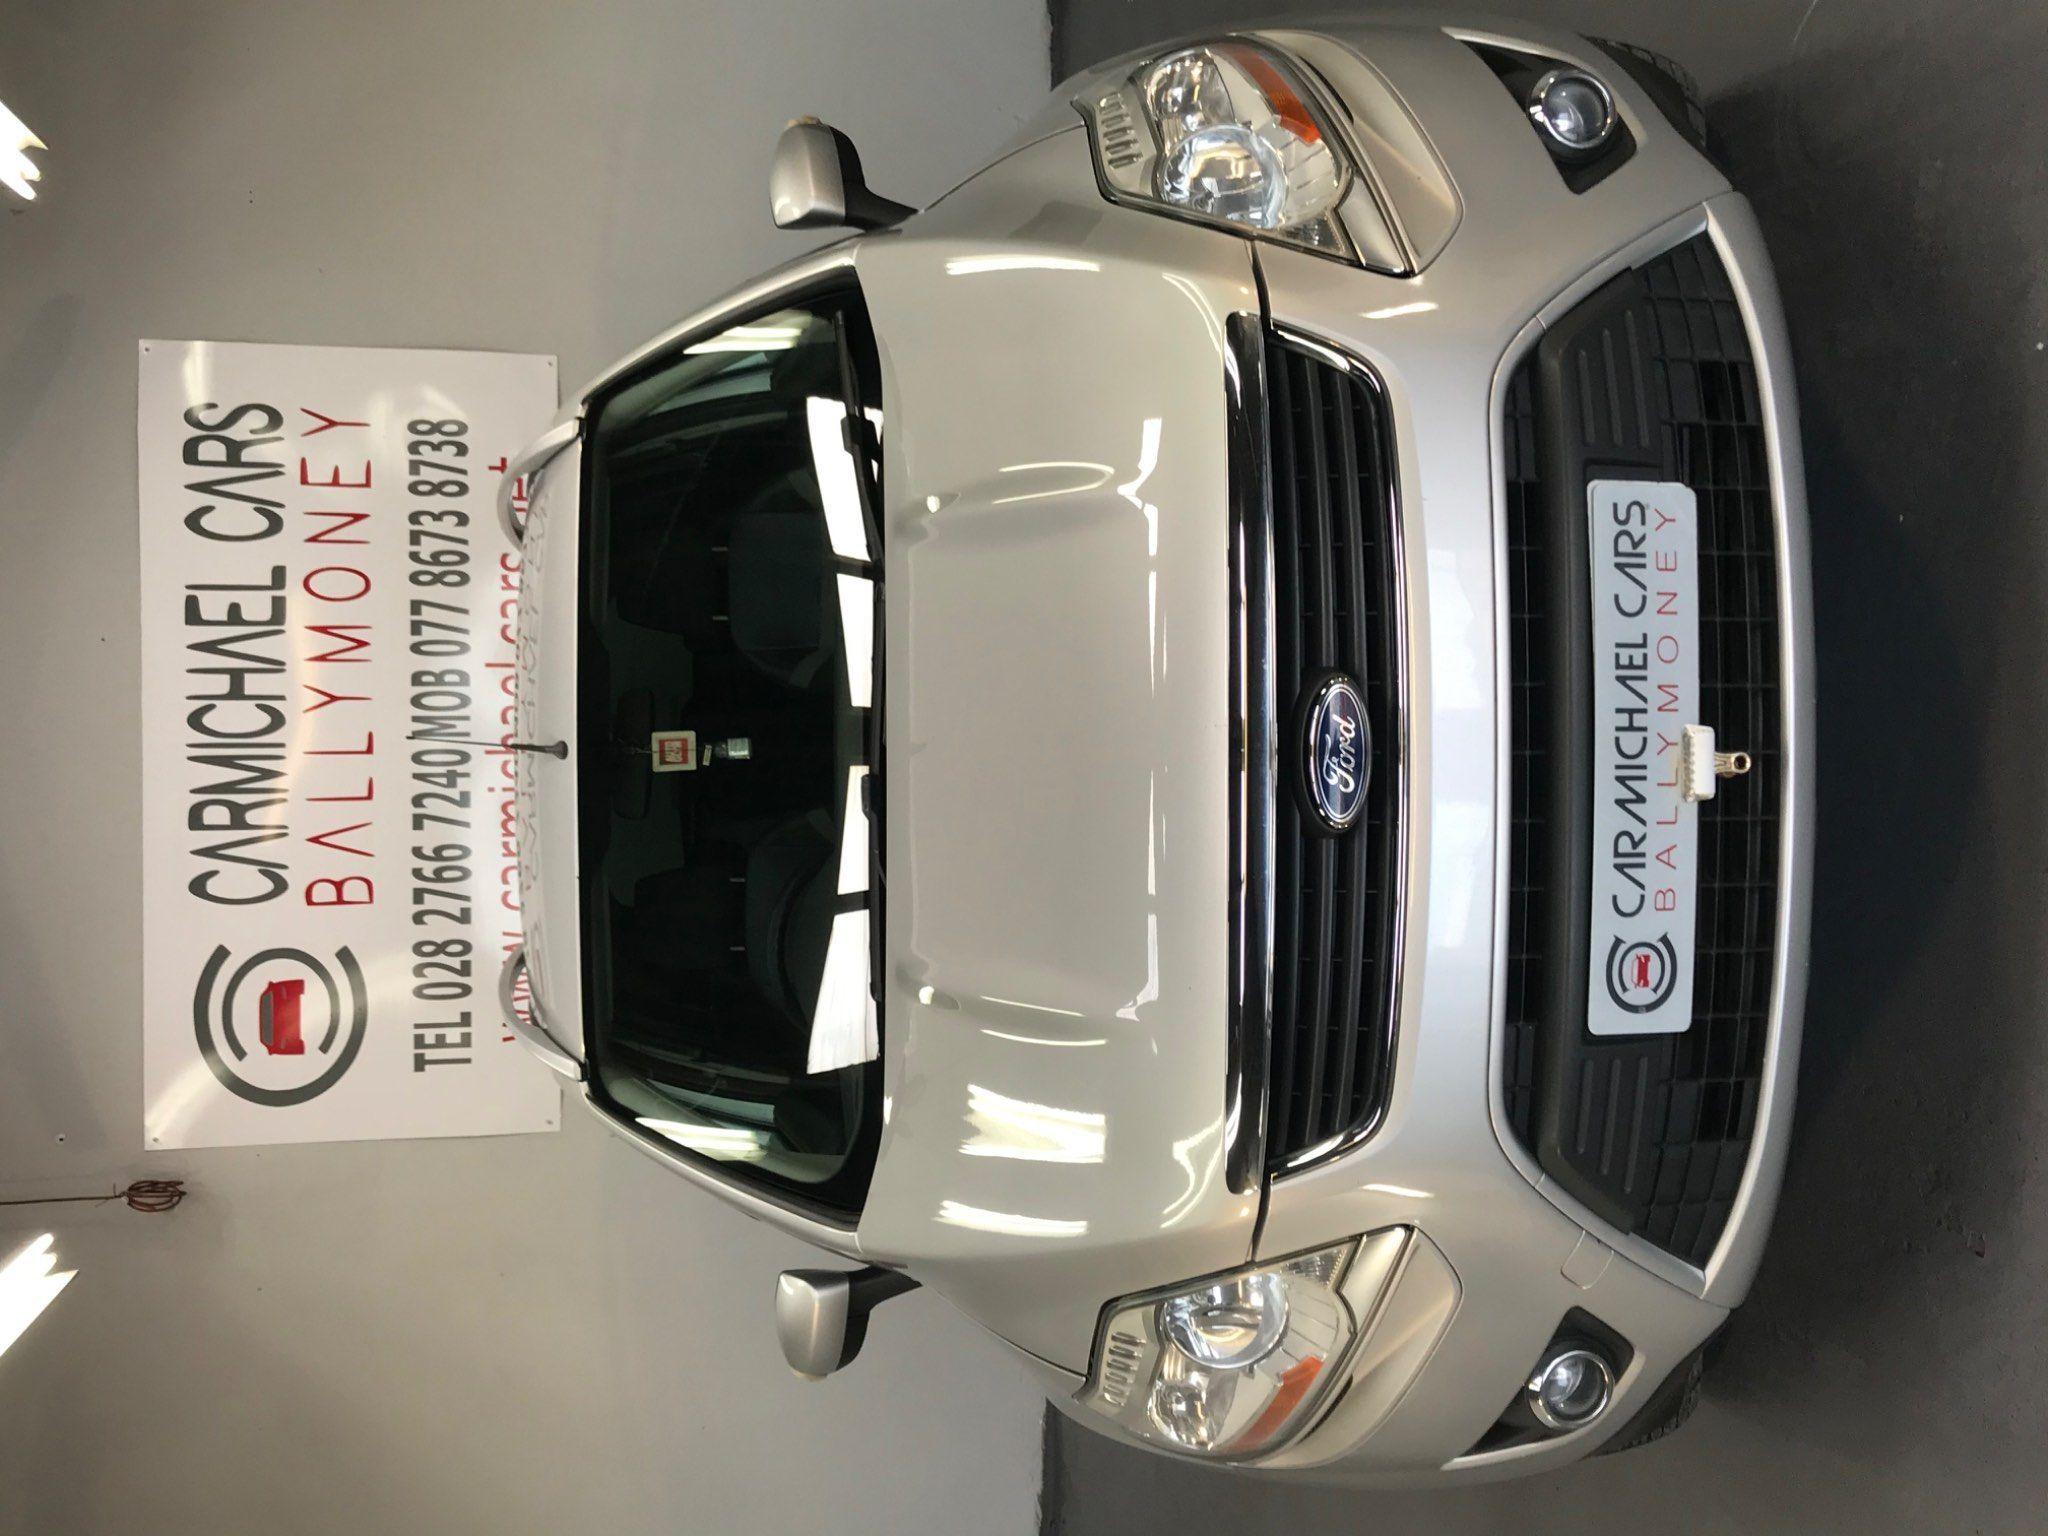 2010 FORD Kuga 2.0 TDCi Zetec 4×4 Diesel Manual SILVER, 127K, – Carmichael Cars Ballymoney full